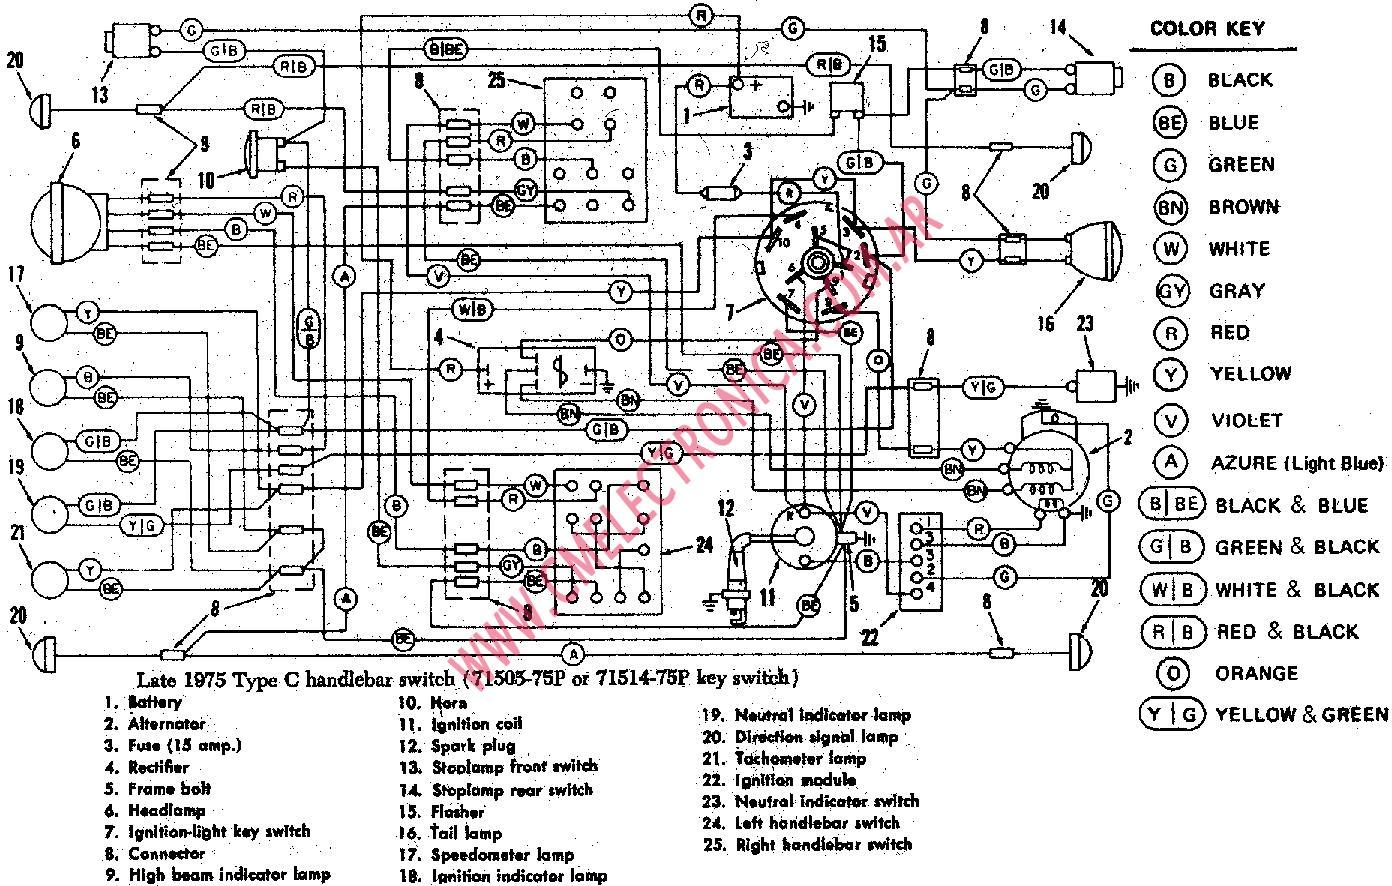 magnificent honda shadow 750 wiring schematic ornament electrical rh thetada com Honda Accord Wiring Harness Diagram 92 96 Honda Civic Alternater Wiring Schematics